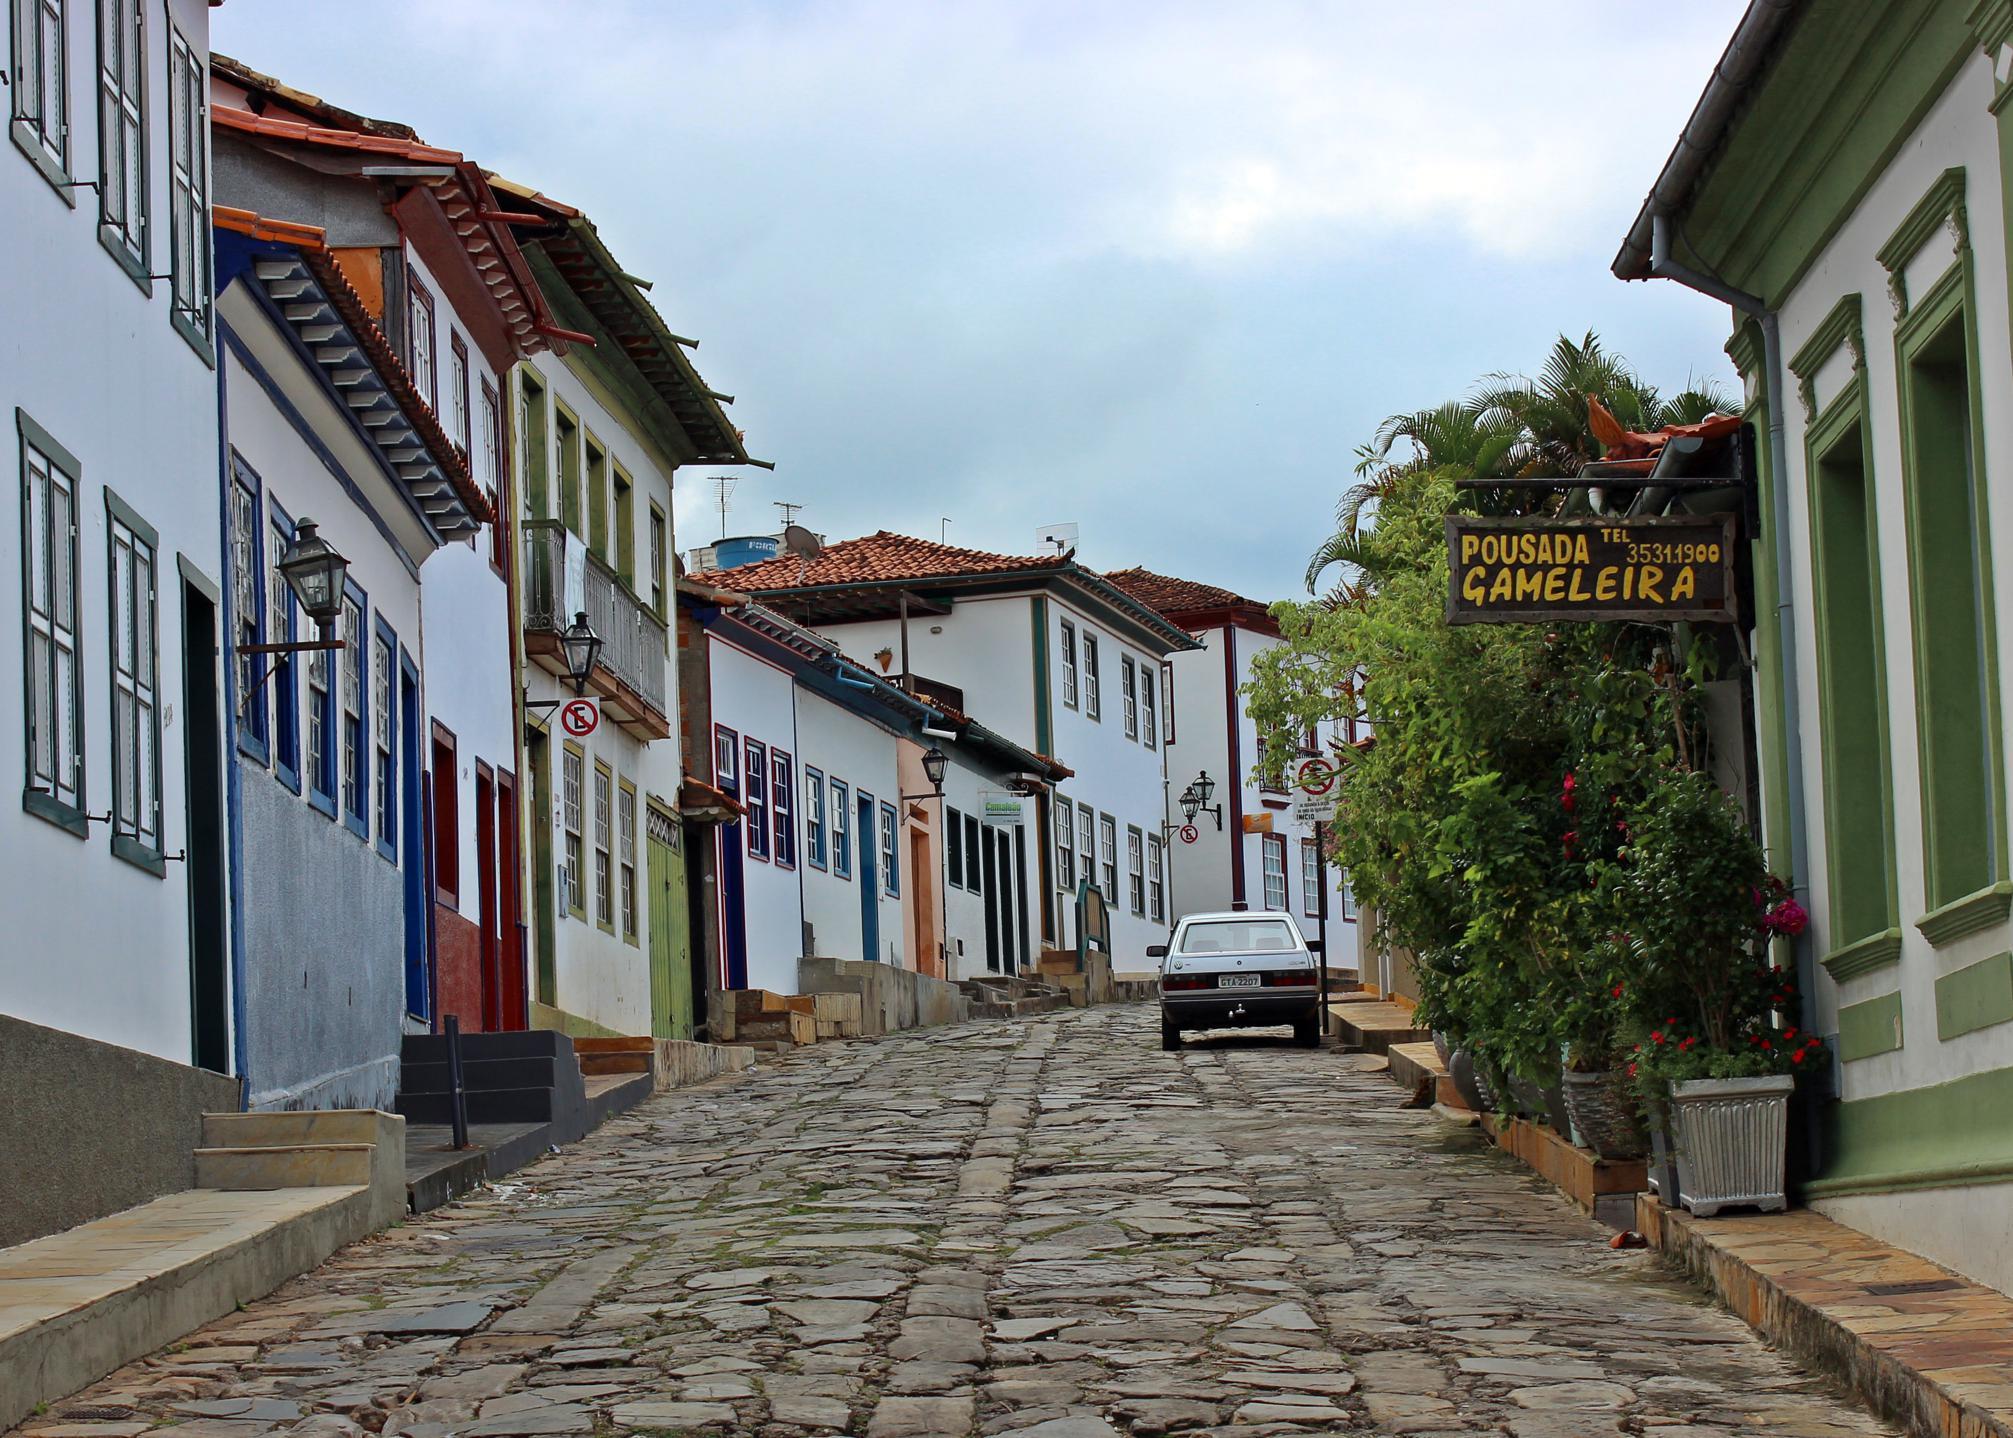 Typical street of the historic center of Diamantina, Brazil. Photo by Natália Gonçalves